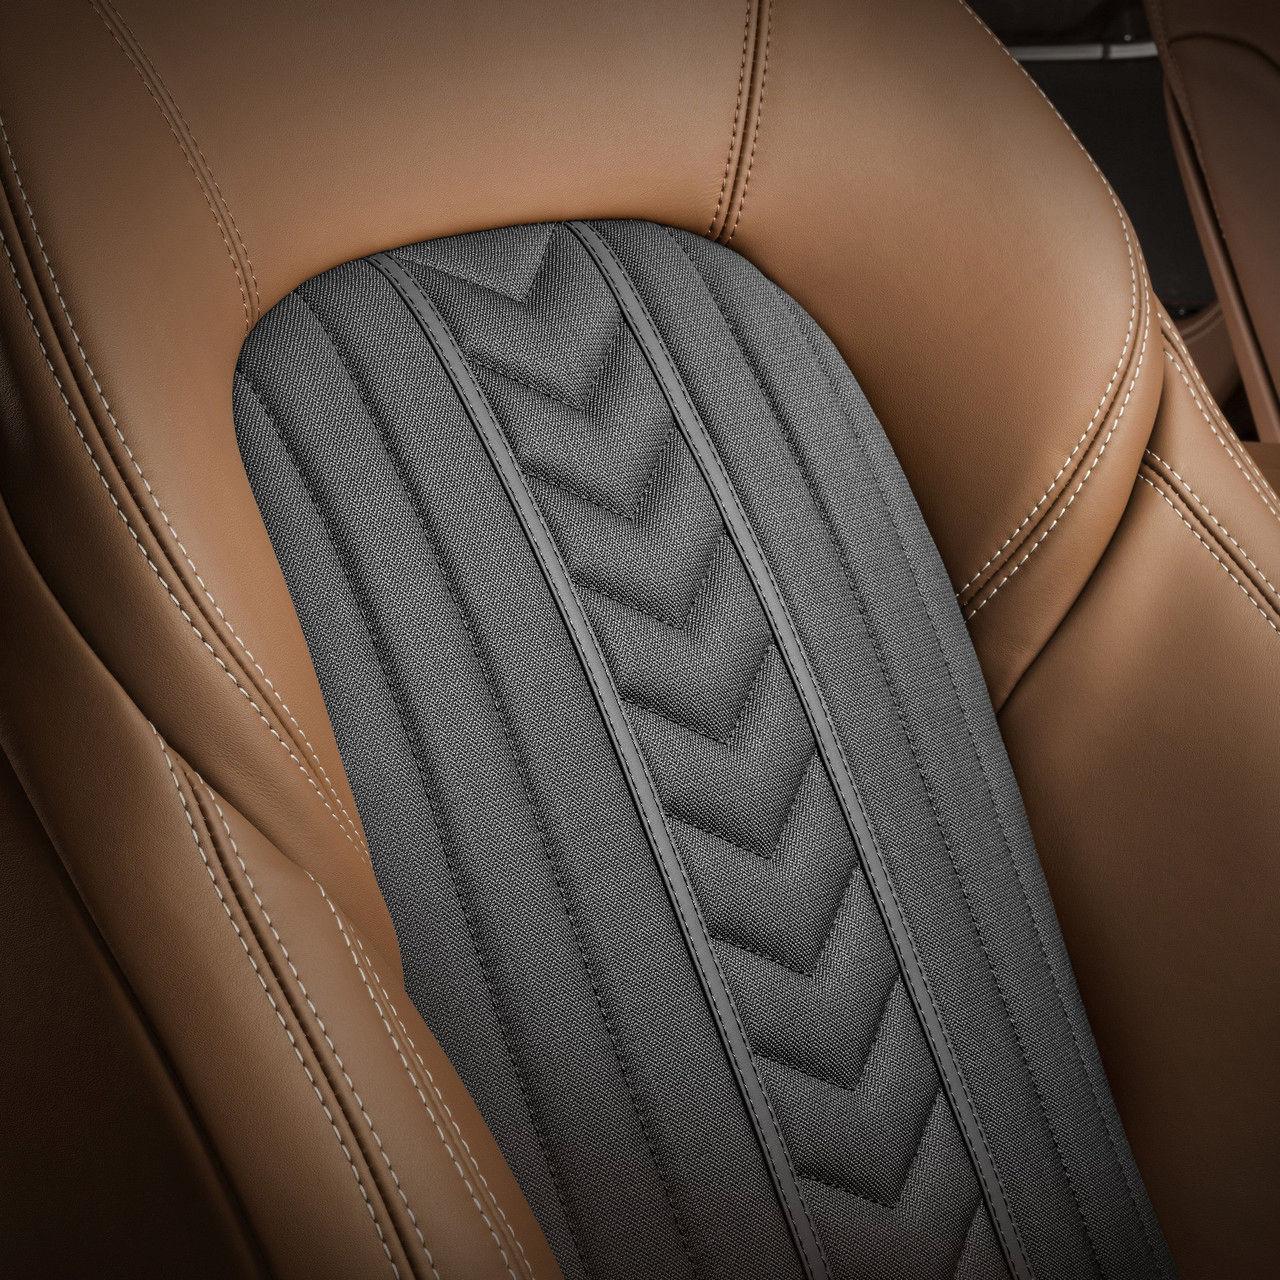 Maserati Levante Gran Lusso - Ledersitze - Nahaufnahme